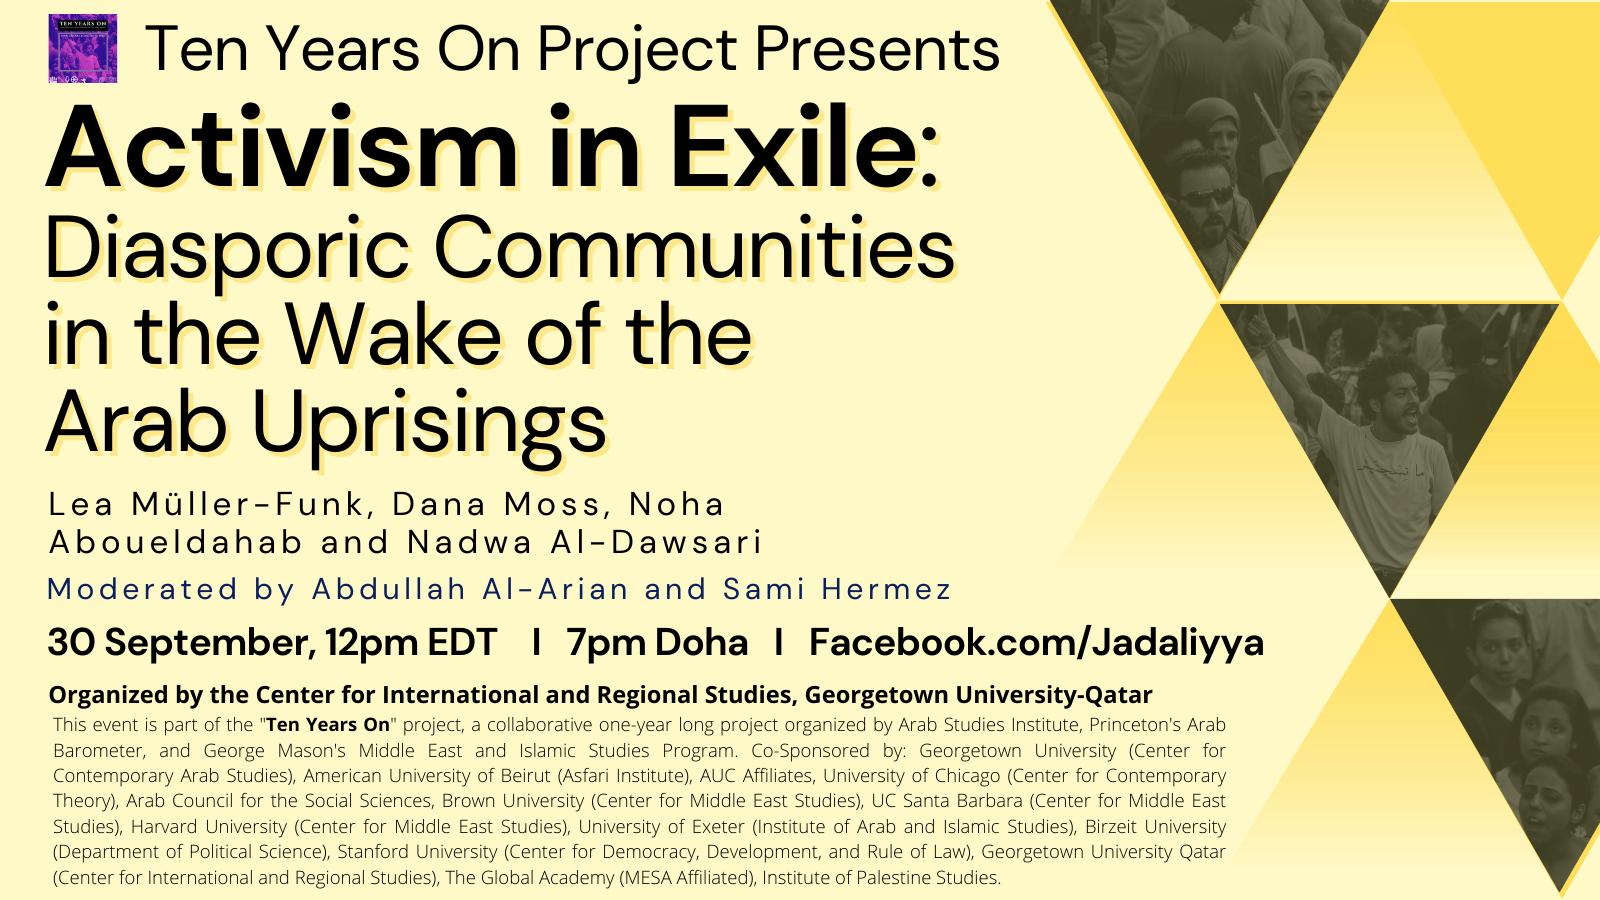 Activism in Exile: Diasporic Communities in the Wake of the Arab Uprisings